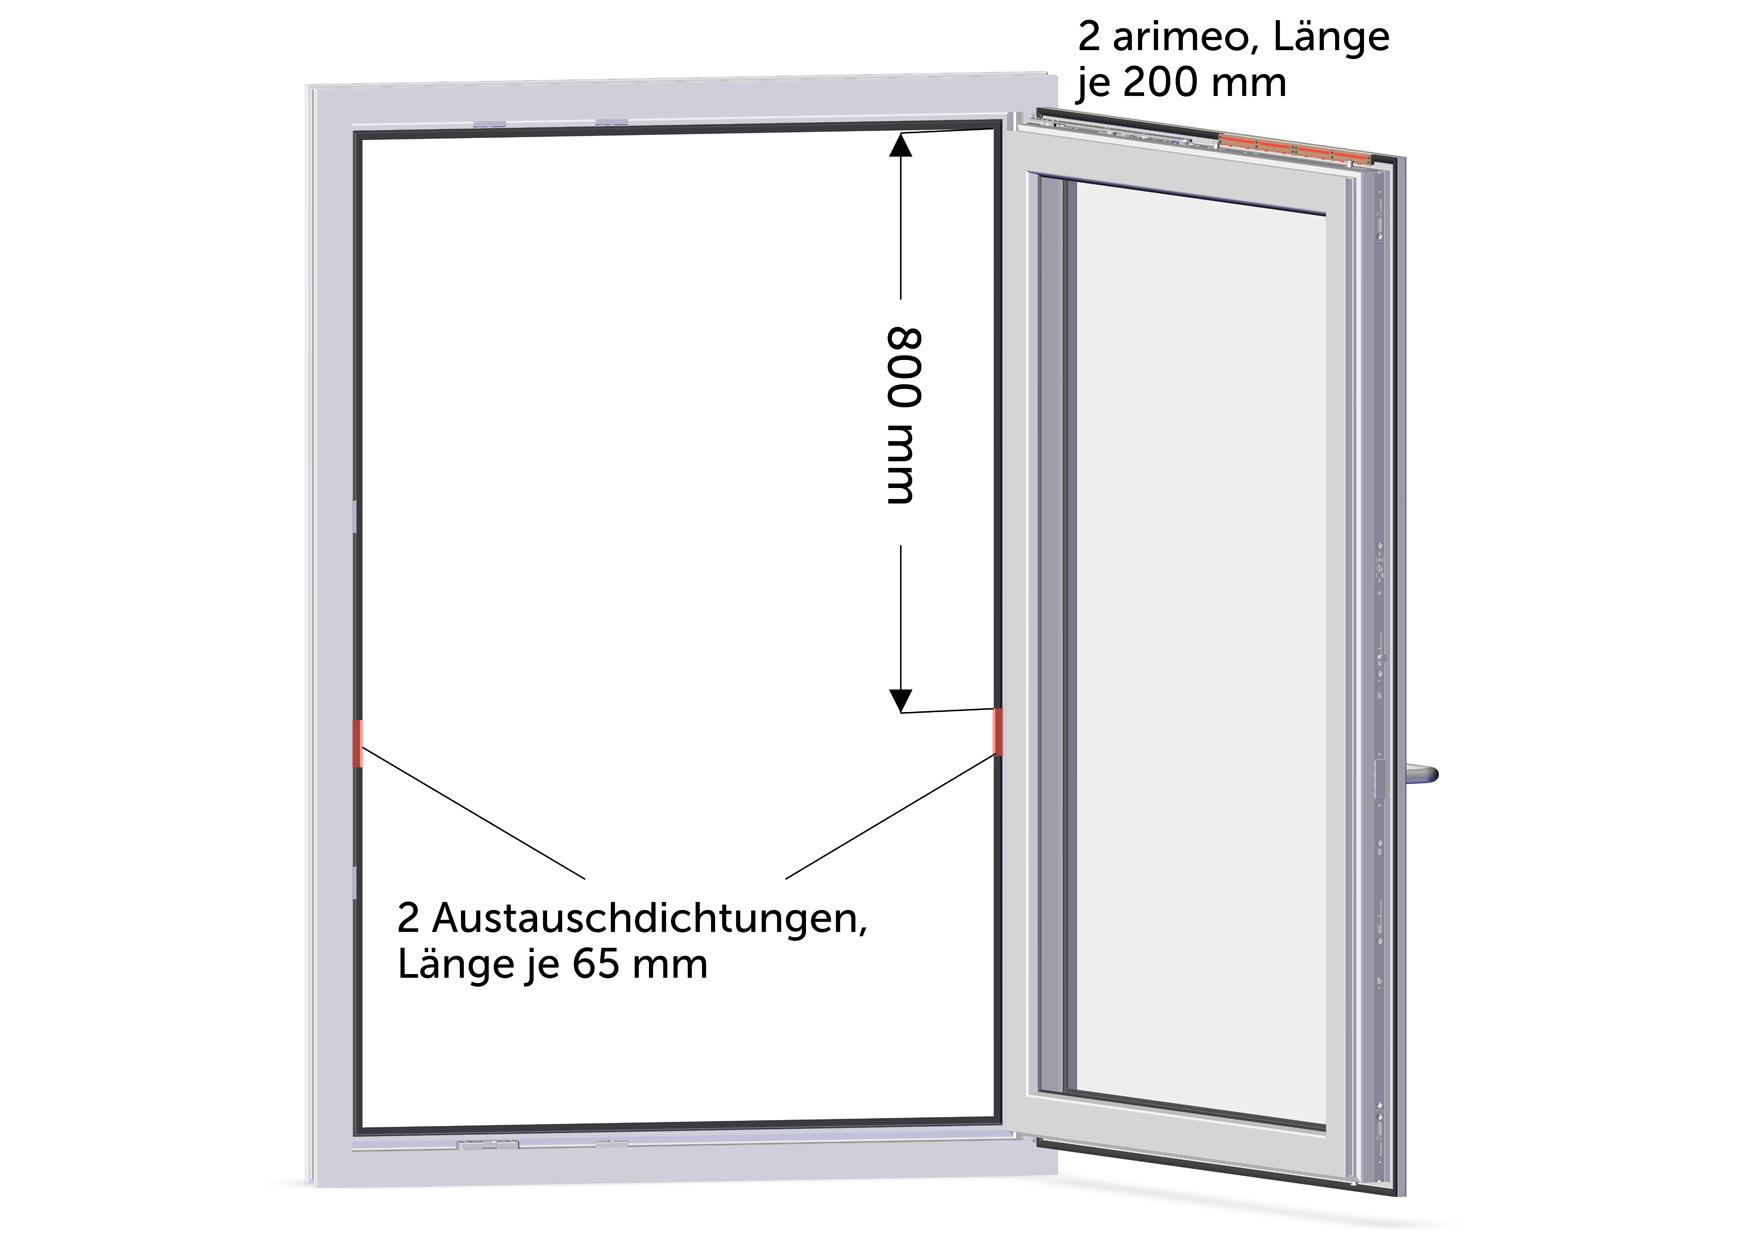 arimeo classic S Fensterfalzlüfter Einbauvariante double acoustic